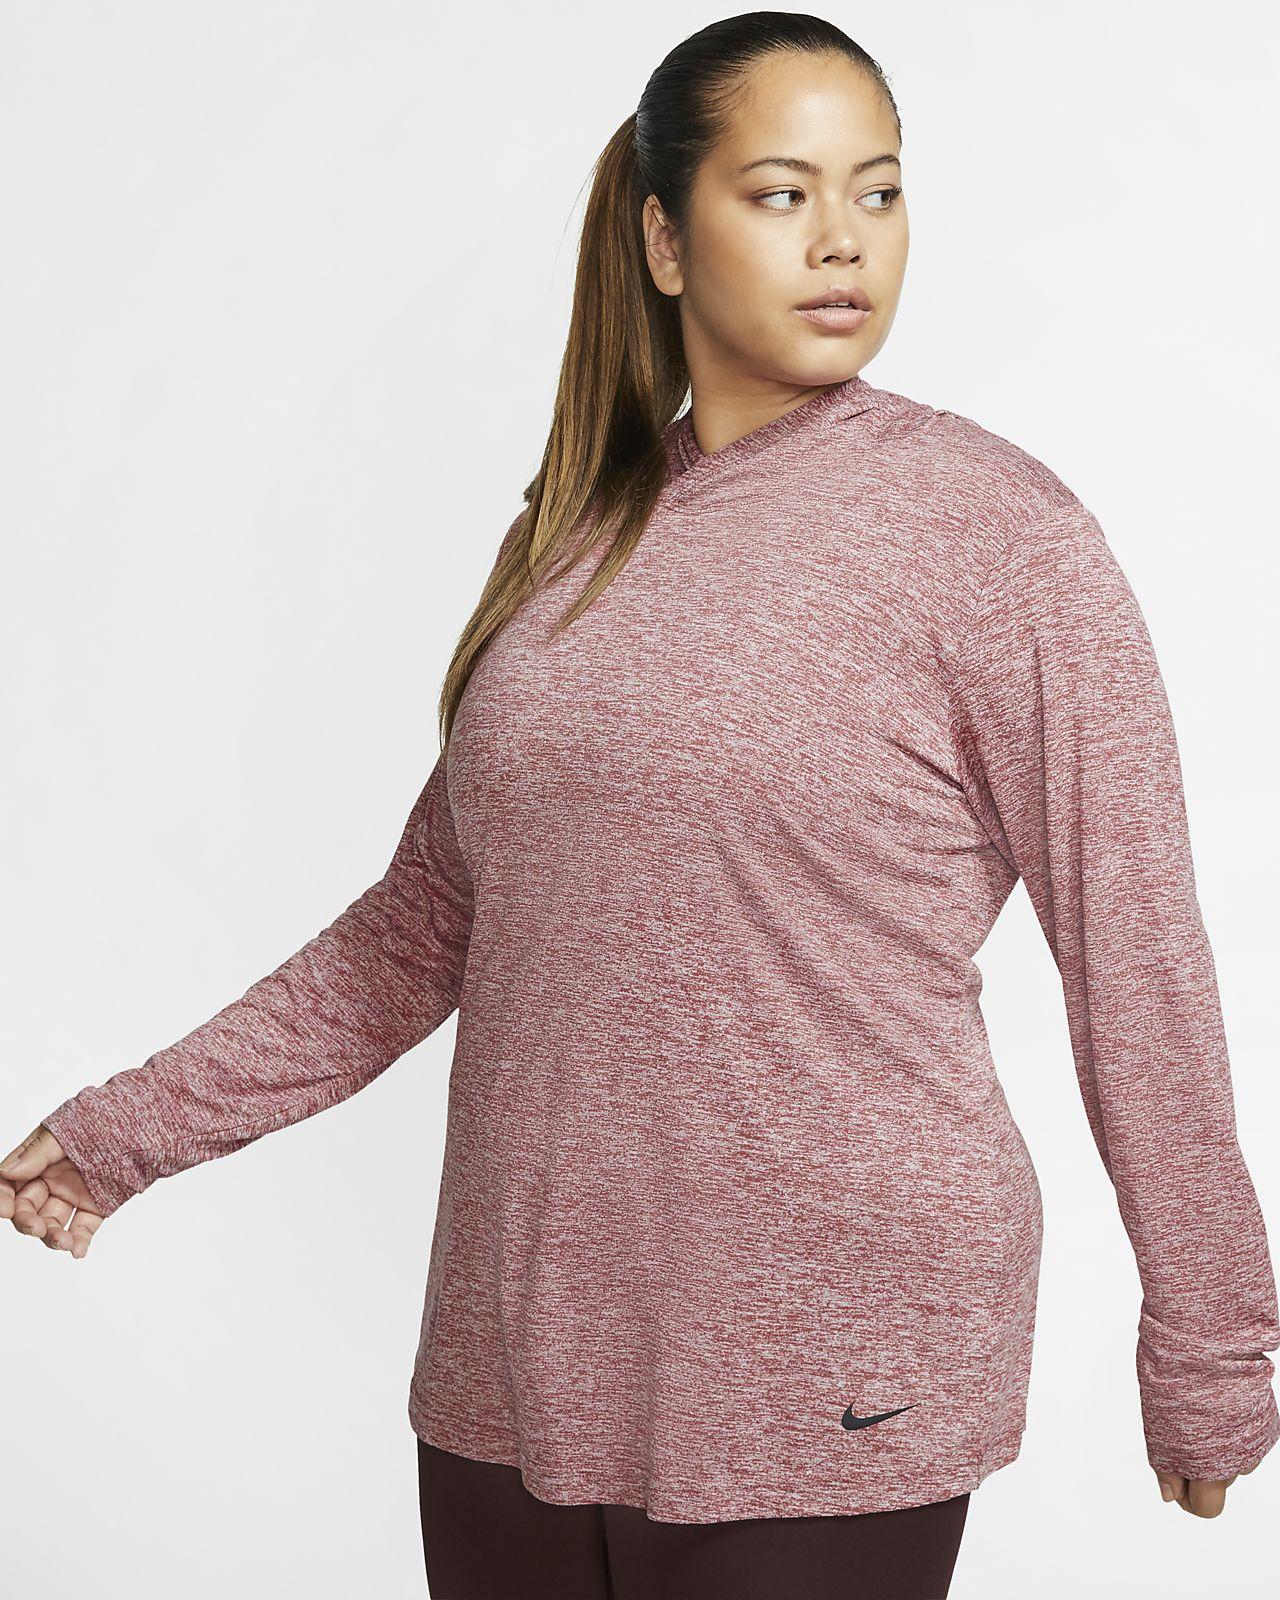 Nike Dri-FIT Legend Women's Long-Sleeve Hooded Training Top (Plus Size)